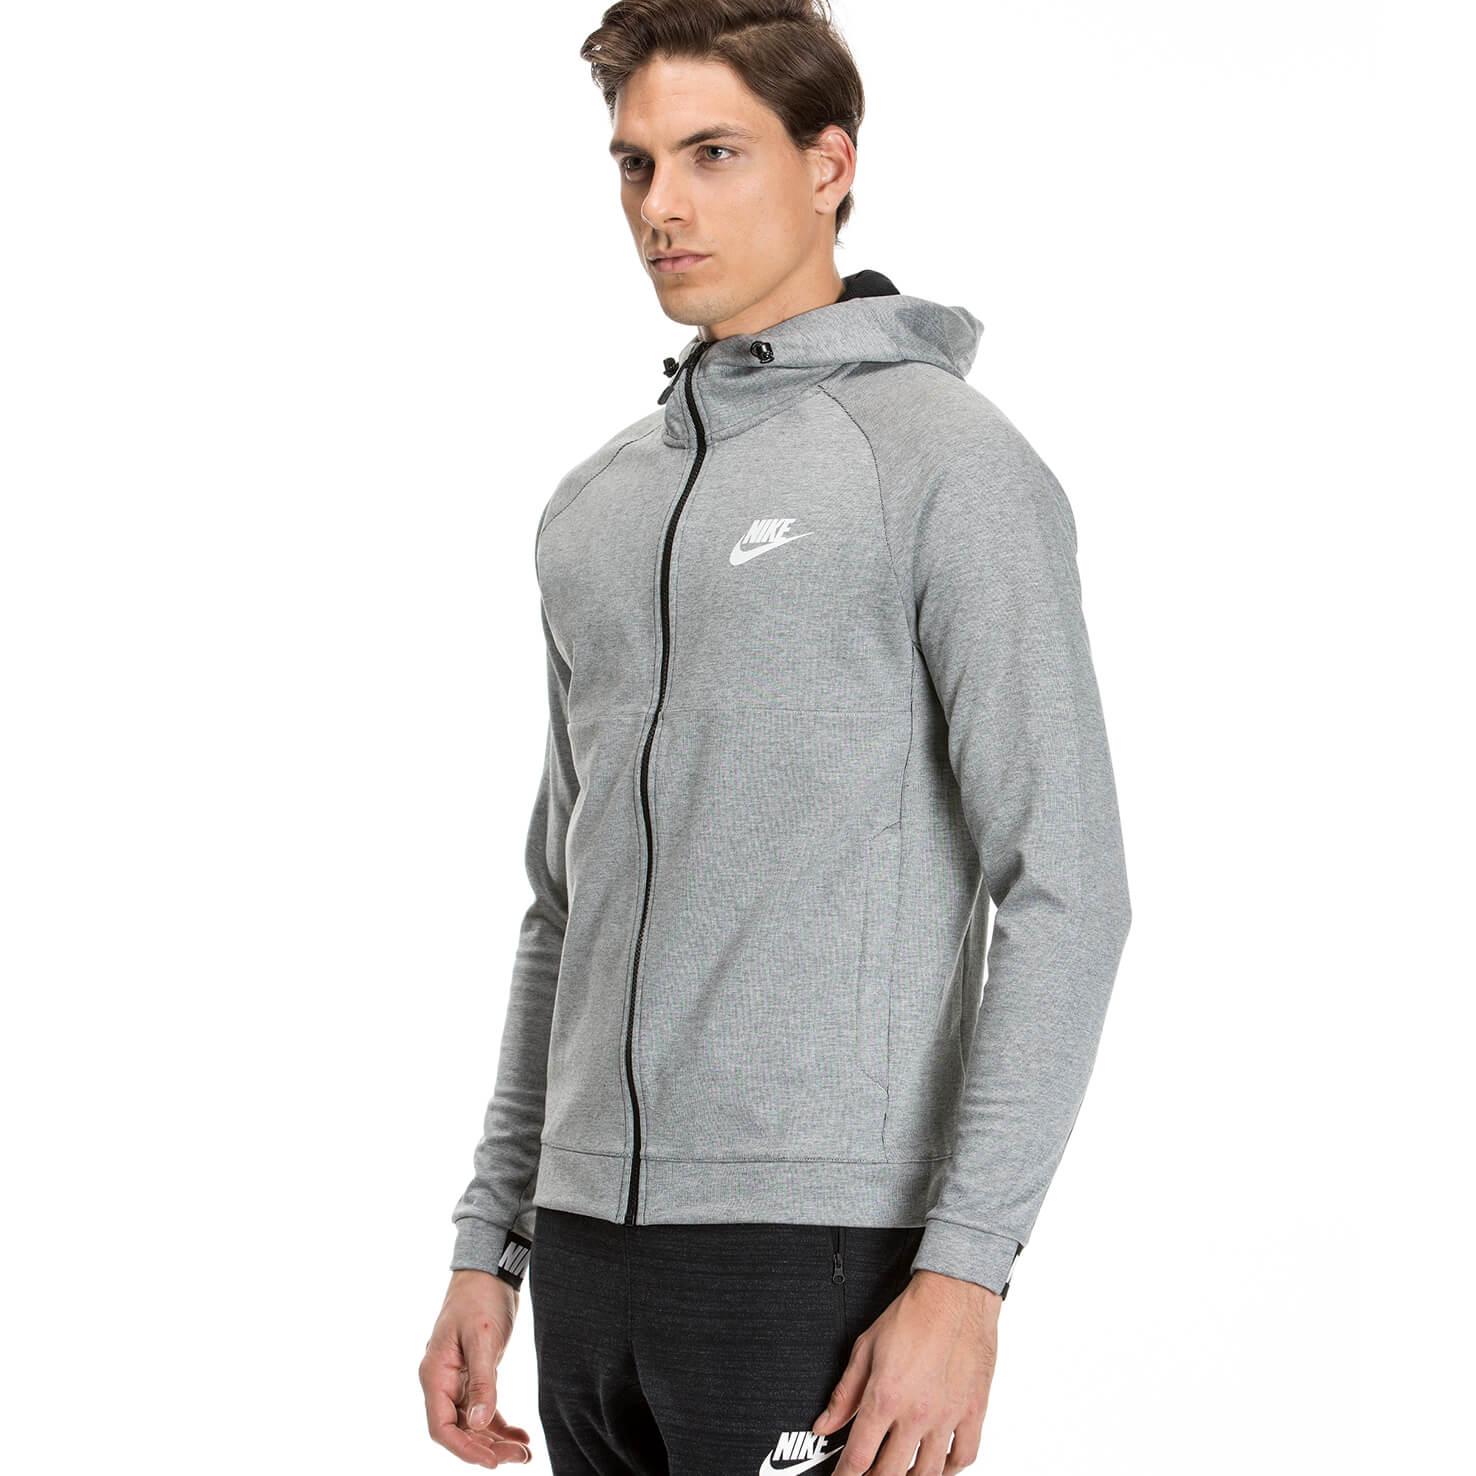 Nike Av15 Crw Flc Erkek Gri Sweatshirt